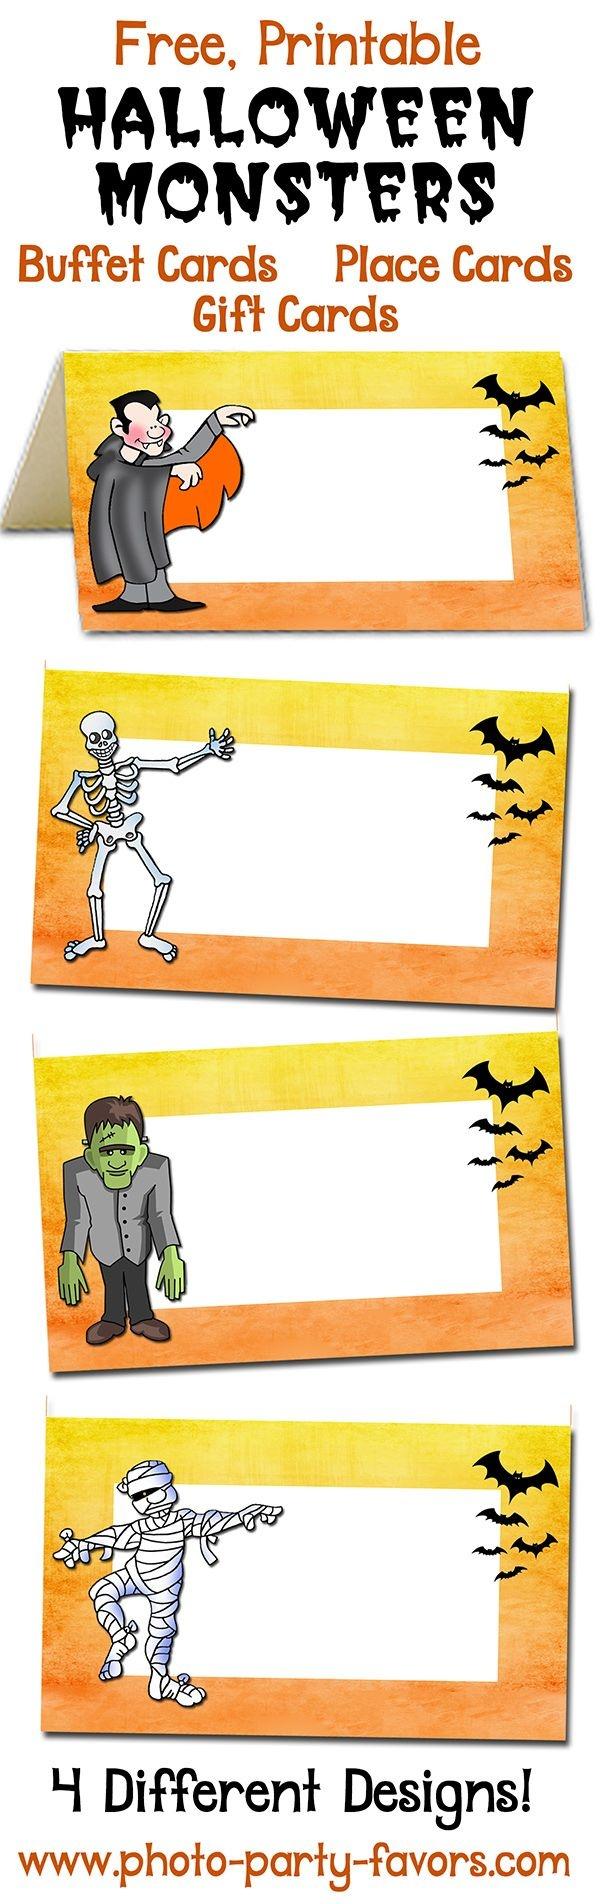 Pinchristi Pew On Hosa Blood Drive | Halloween Buffet, Halloween - Free Printable Halloween Place Cards